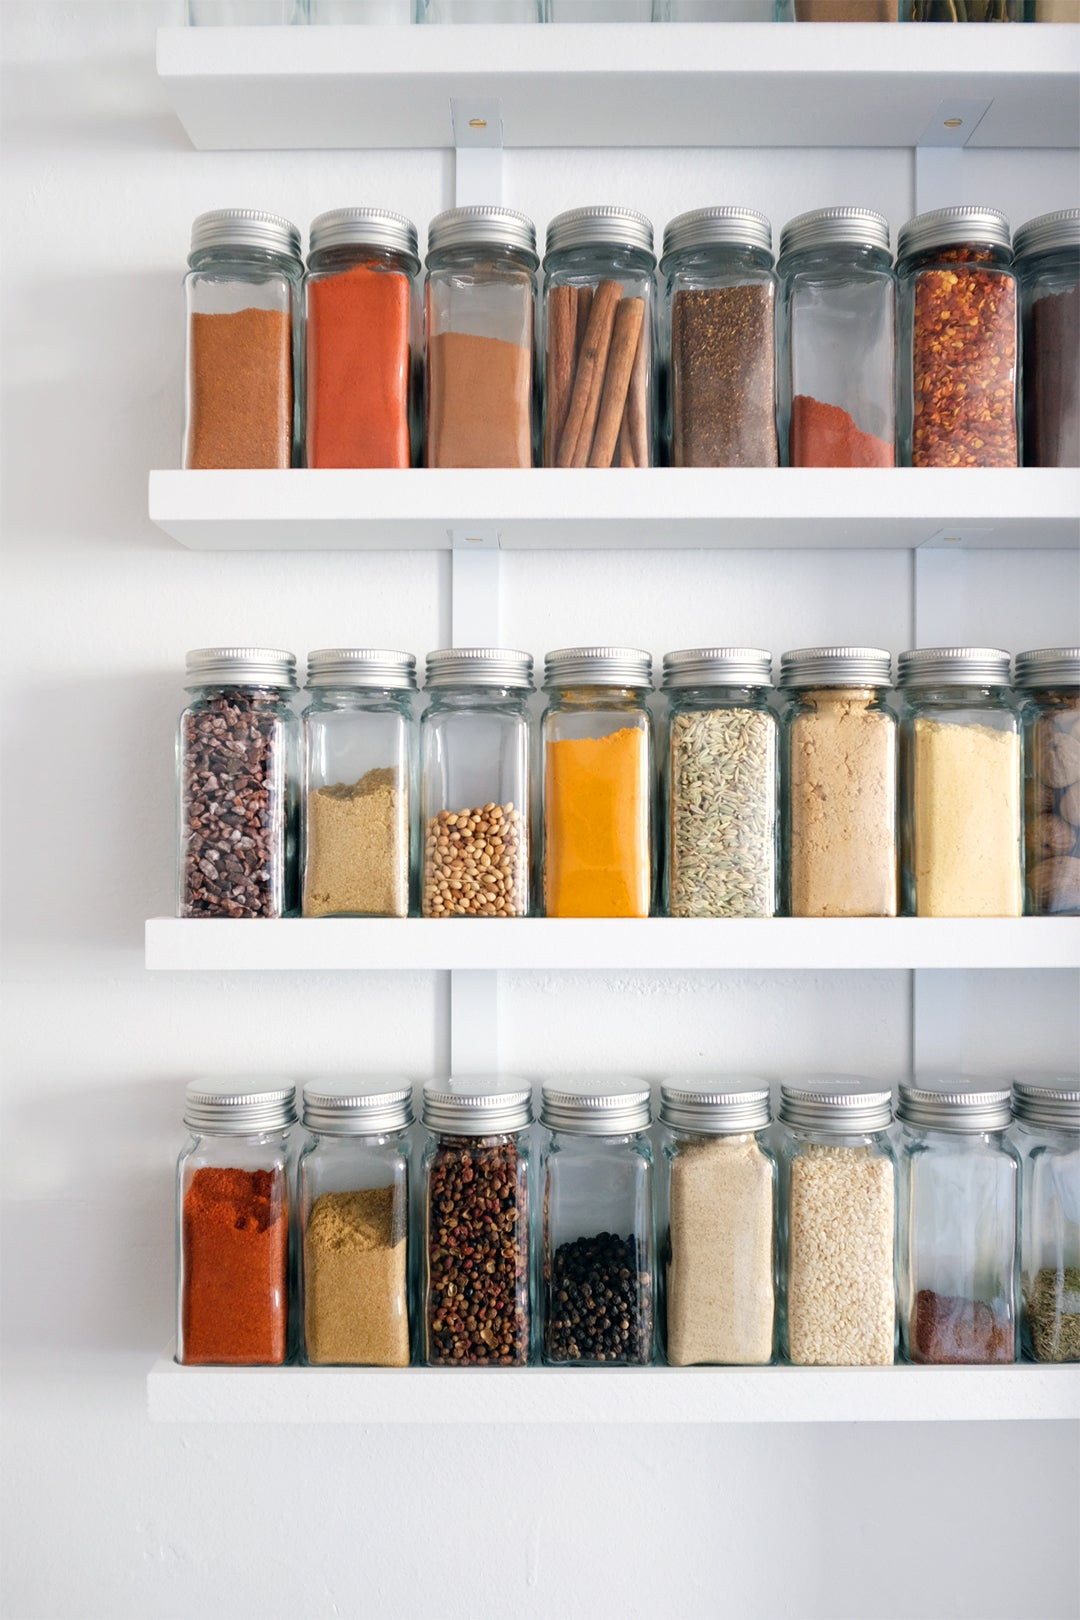 jars of spices on white shelves